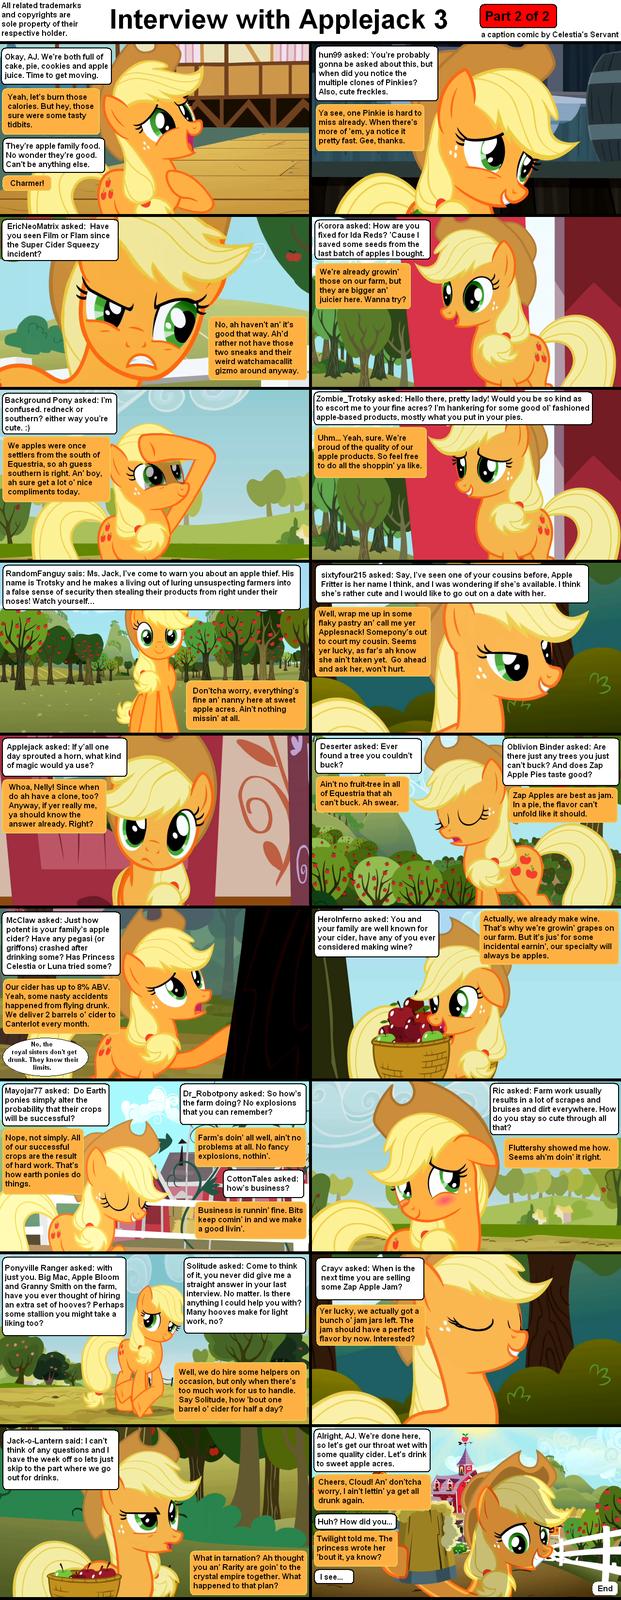 Interview with Applejack 3